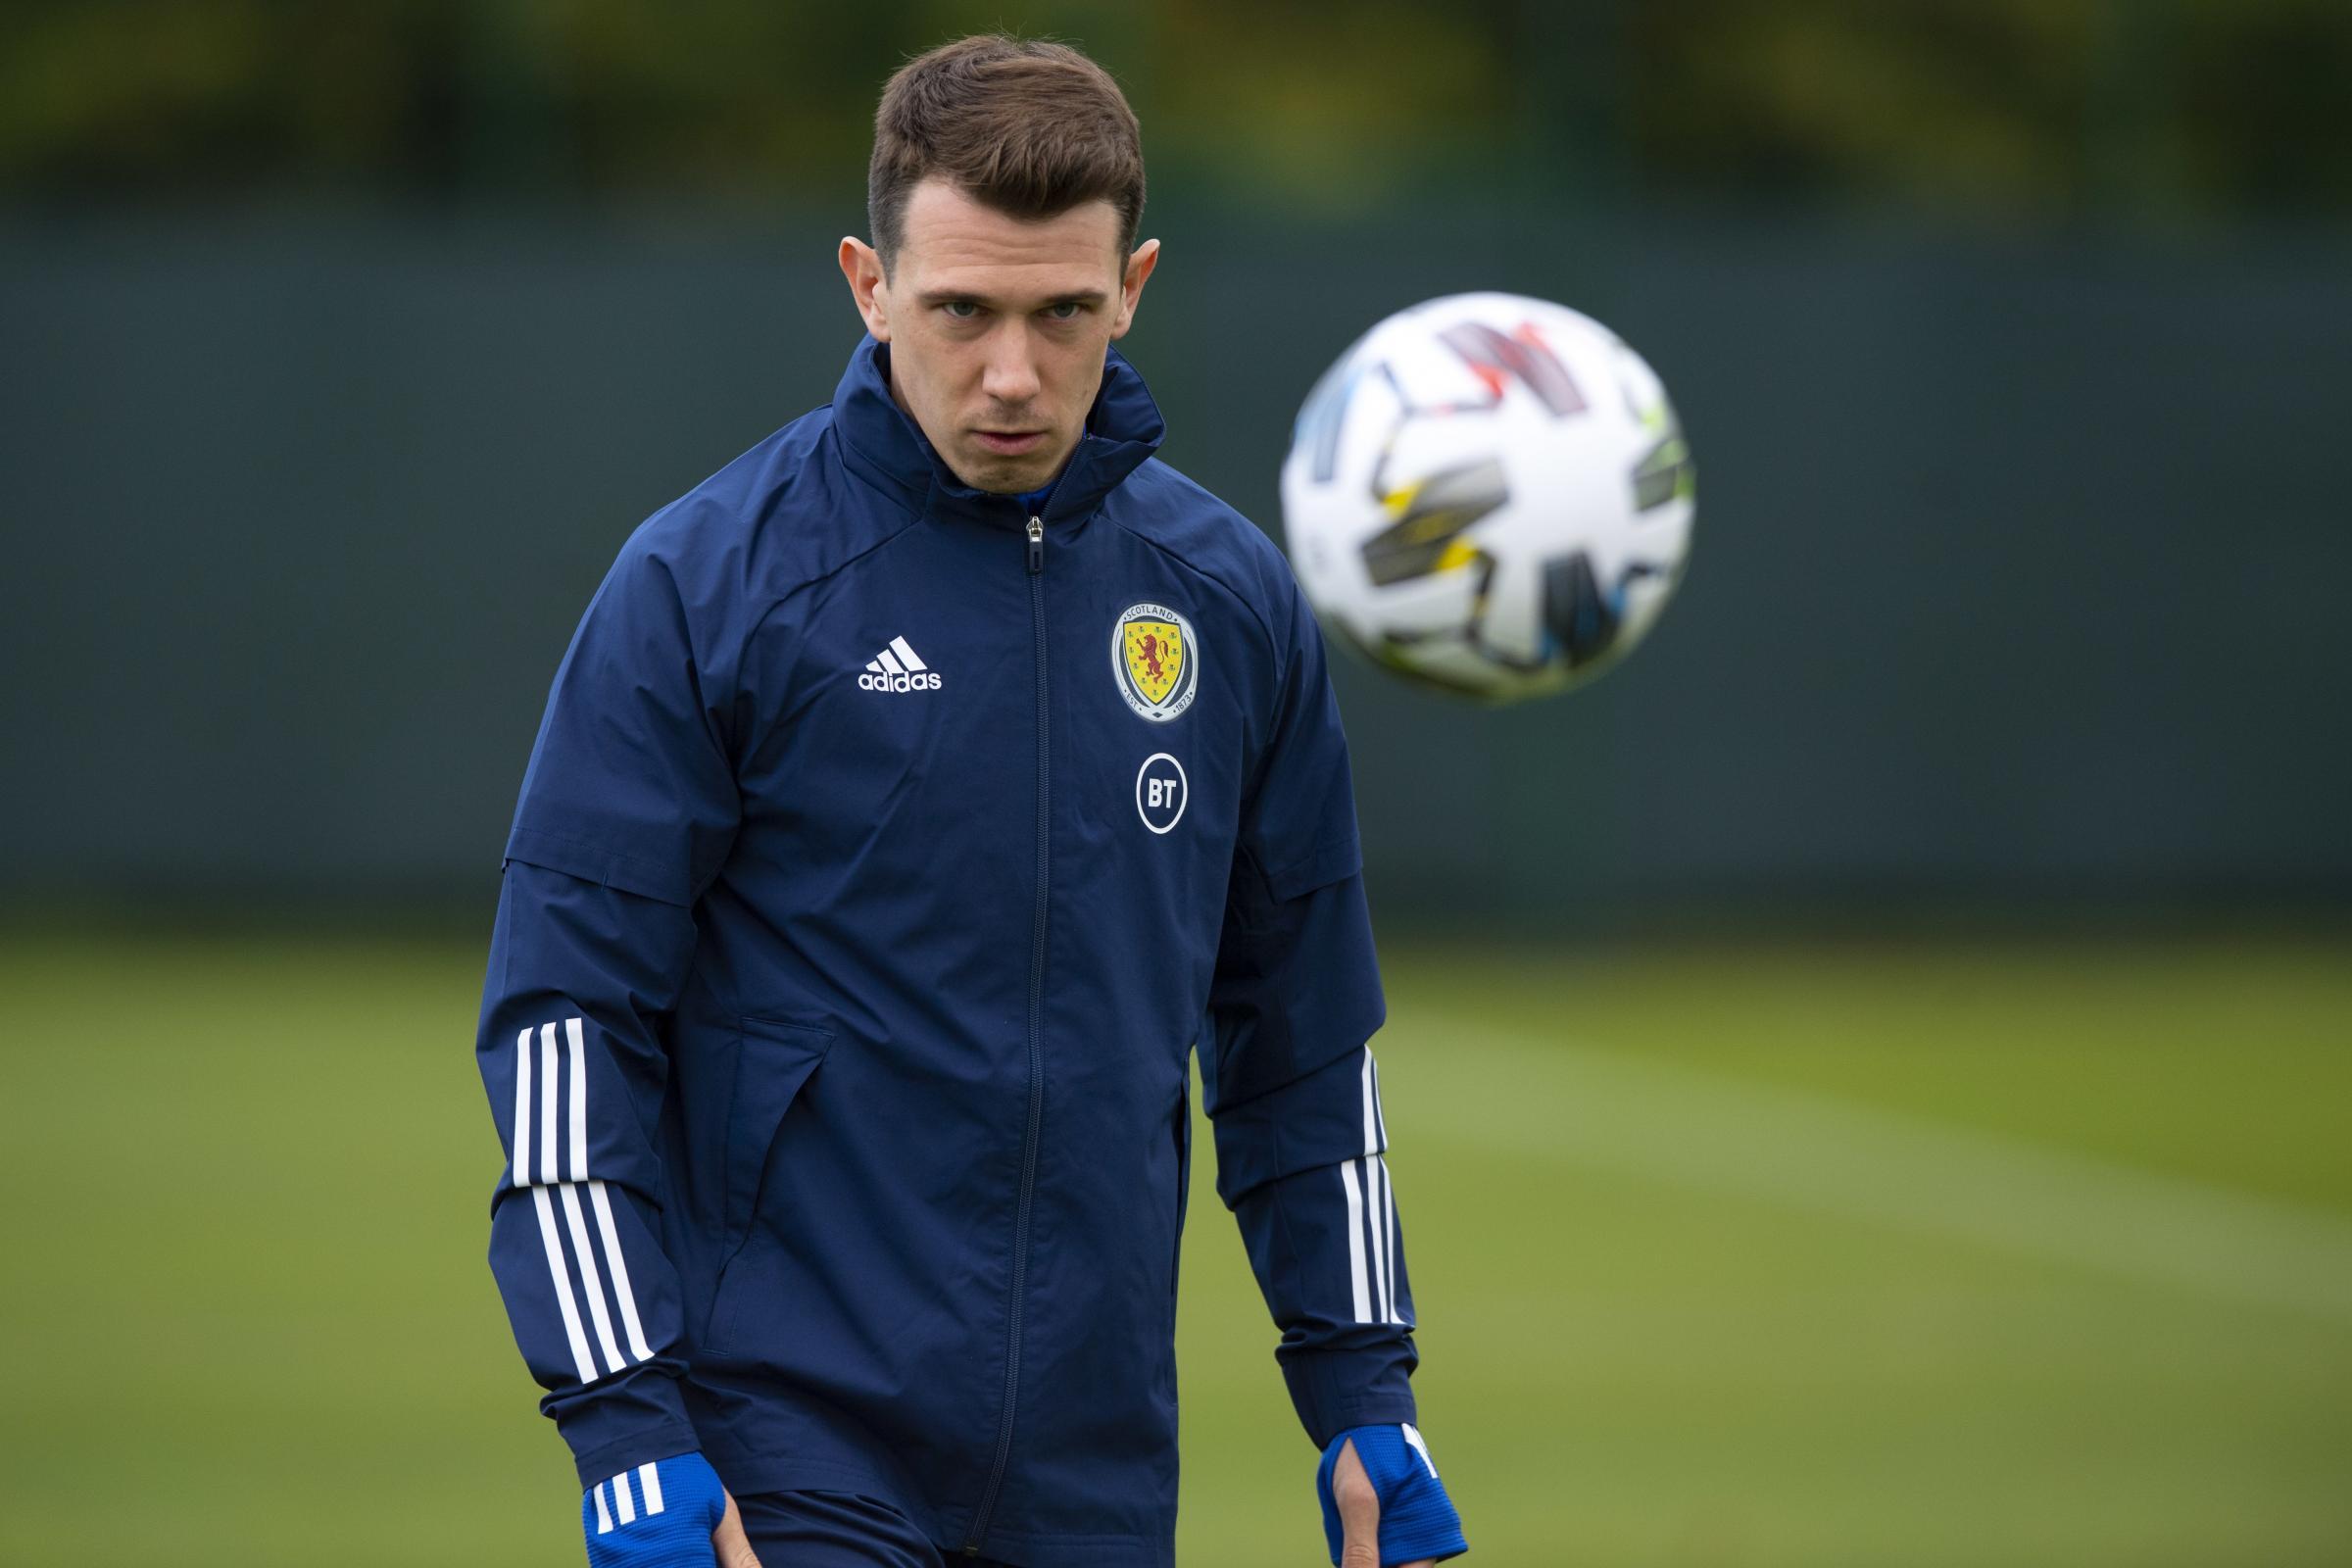 Rangers midfielder Ryan Jack dares to dream as Scotland prepare for their date with destiny